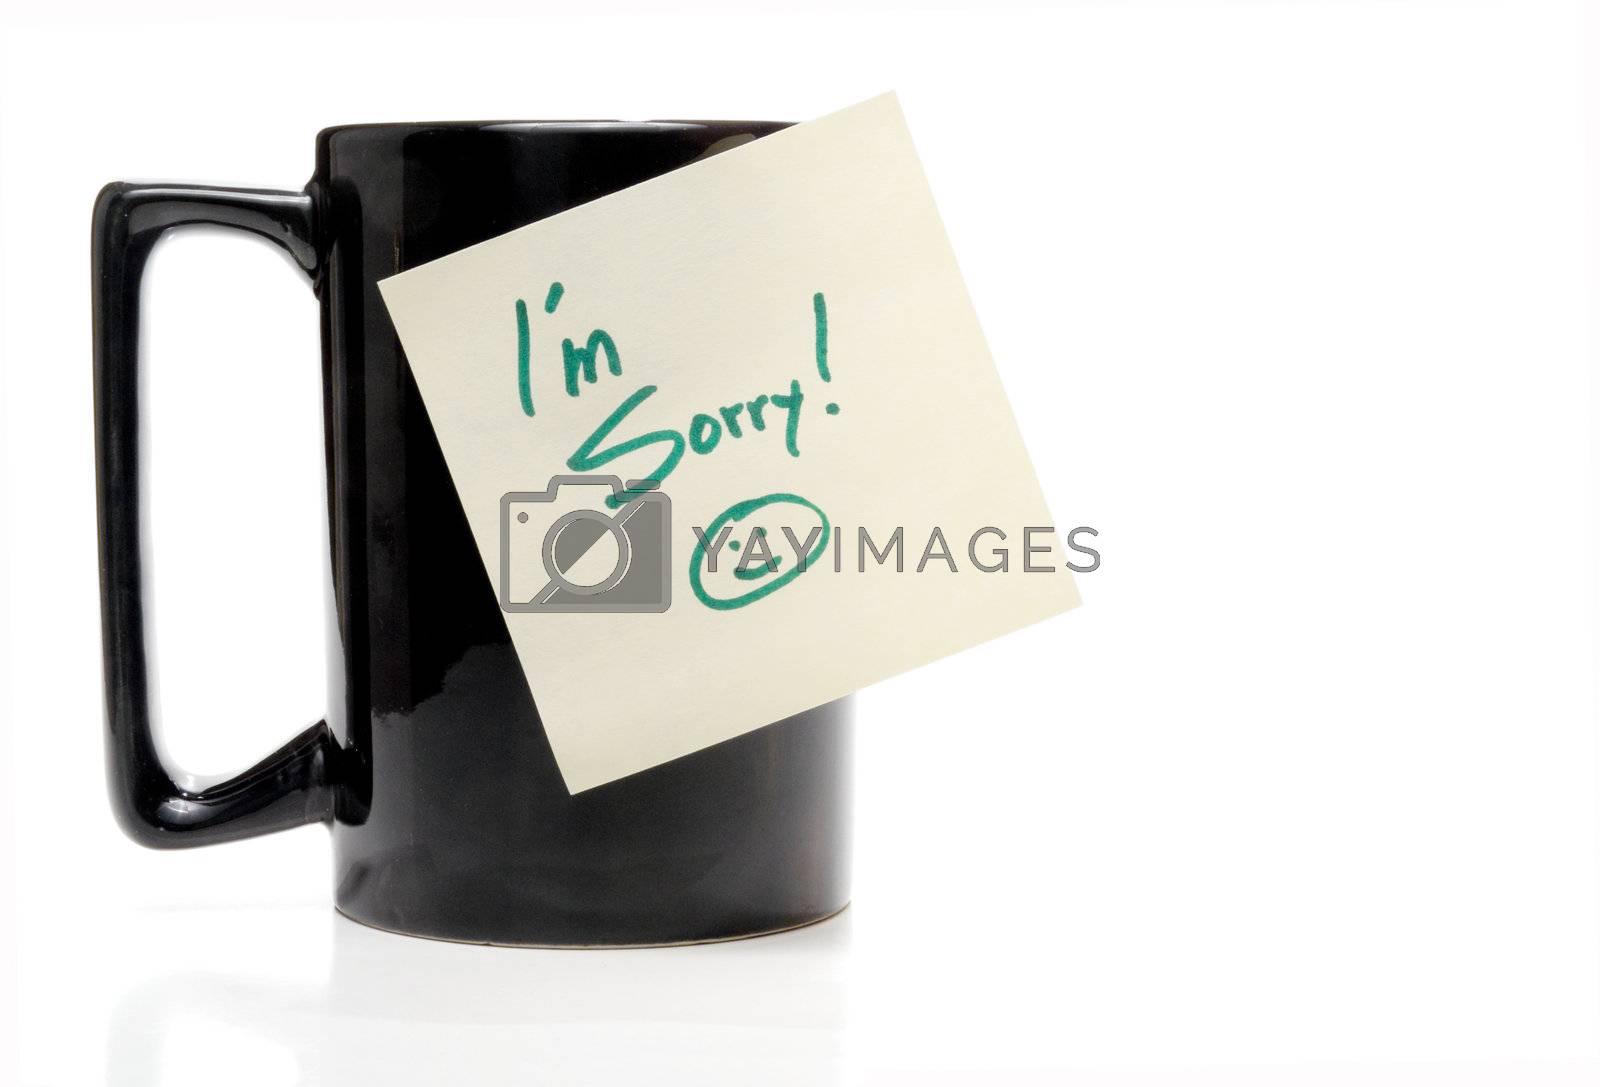 A coffee mug with an Im Sorry note.